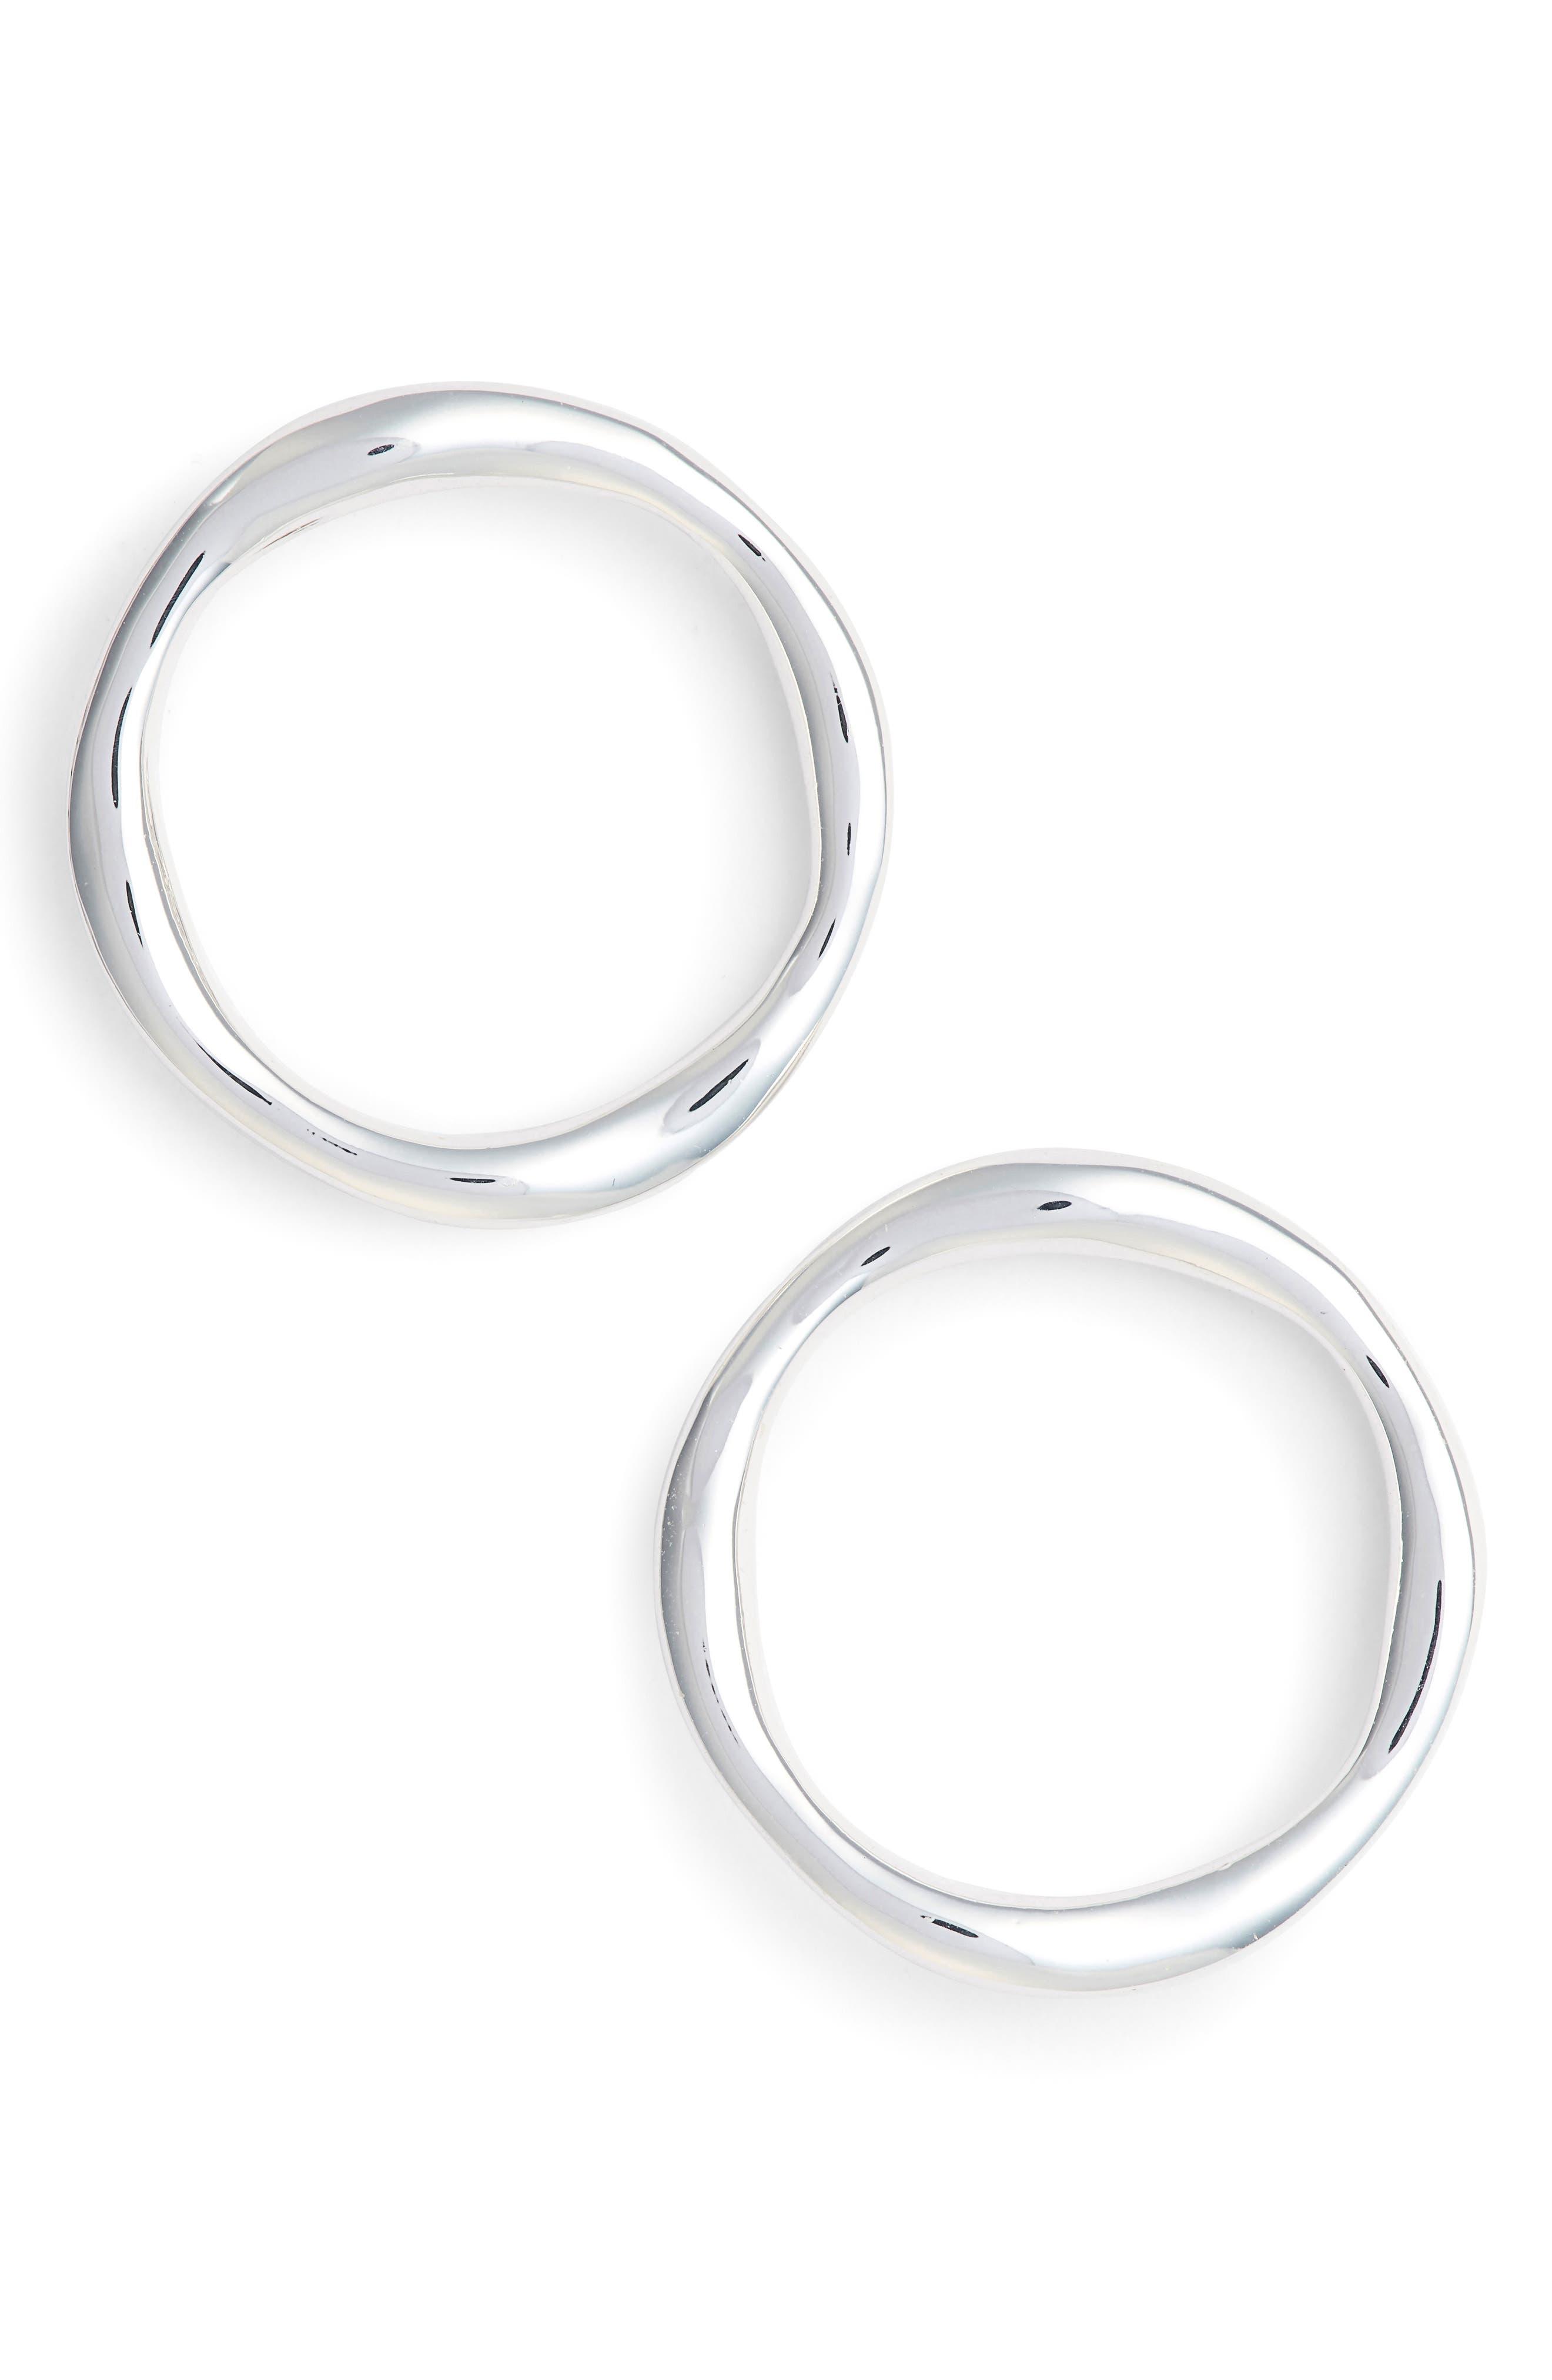 Quinn Frontal Hoop Earrings,                             Main thumbnail 1, color,